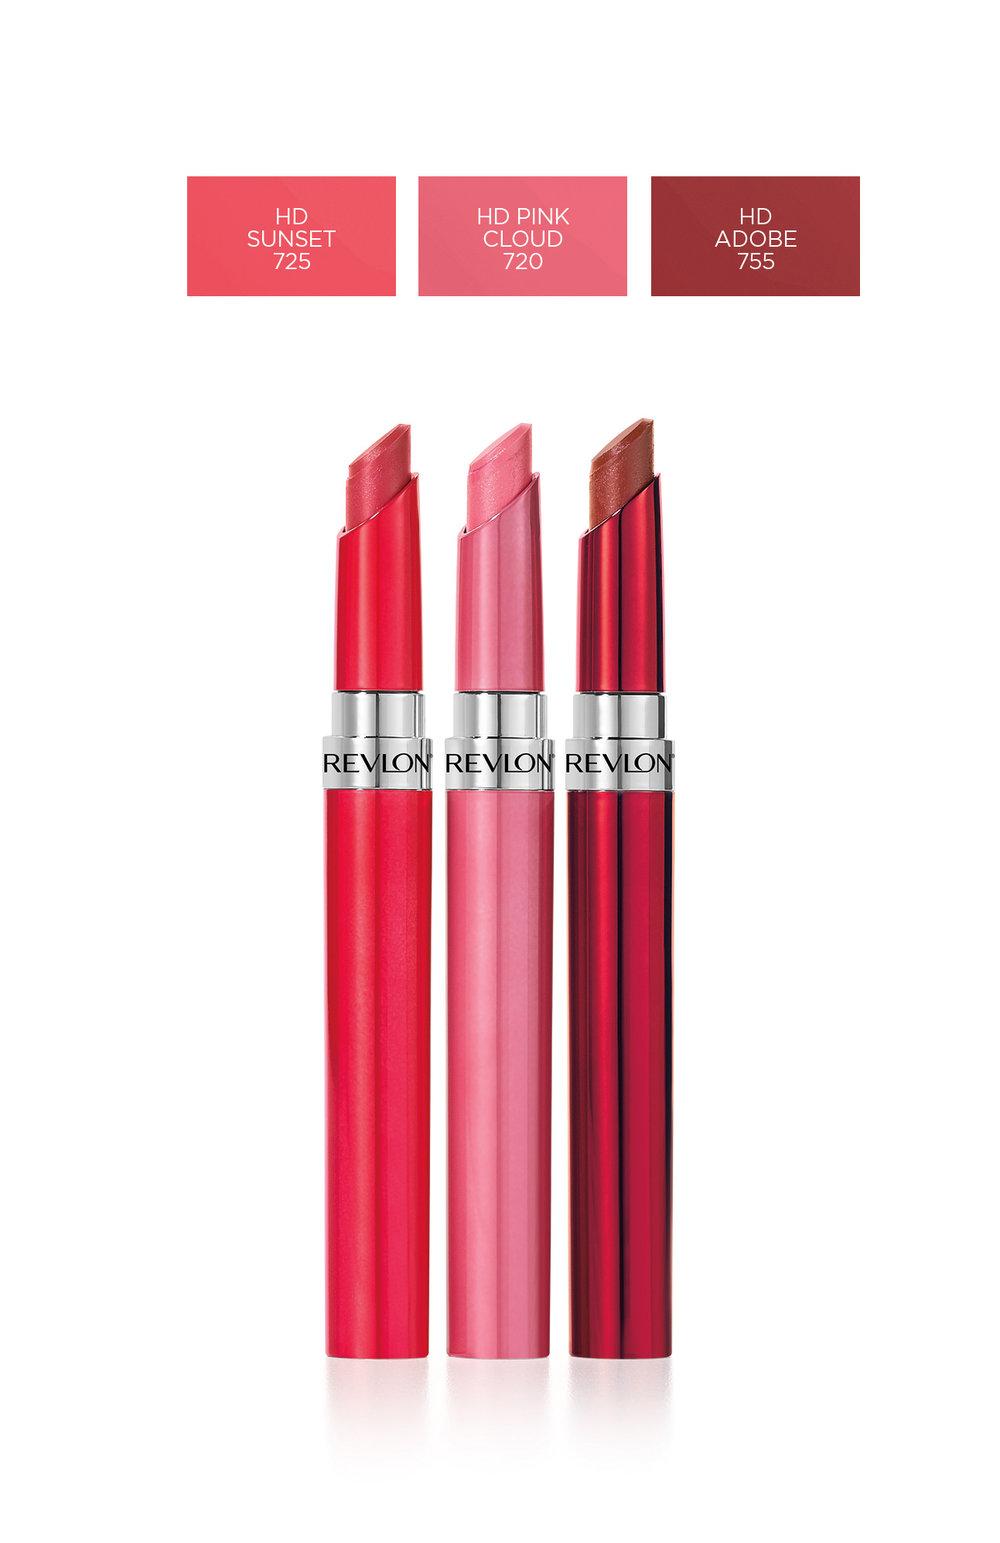 revlon_cosmetics_WRLC004600.jpg